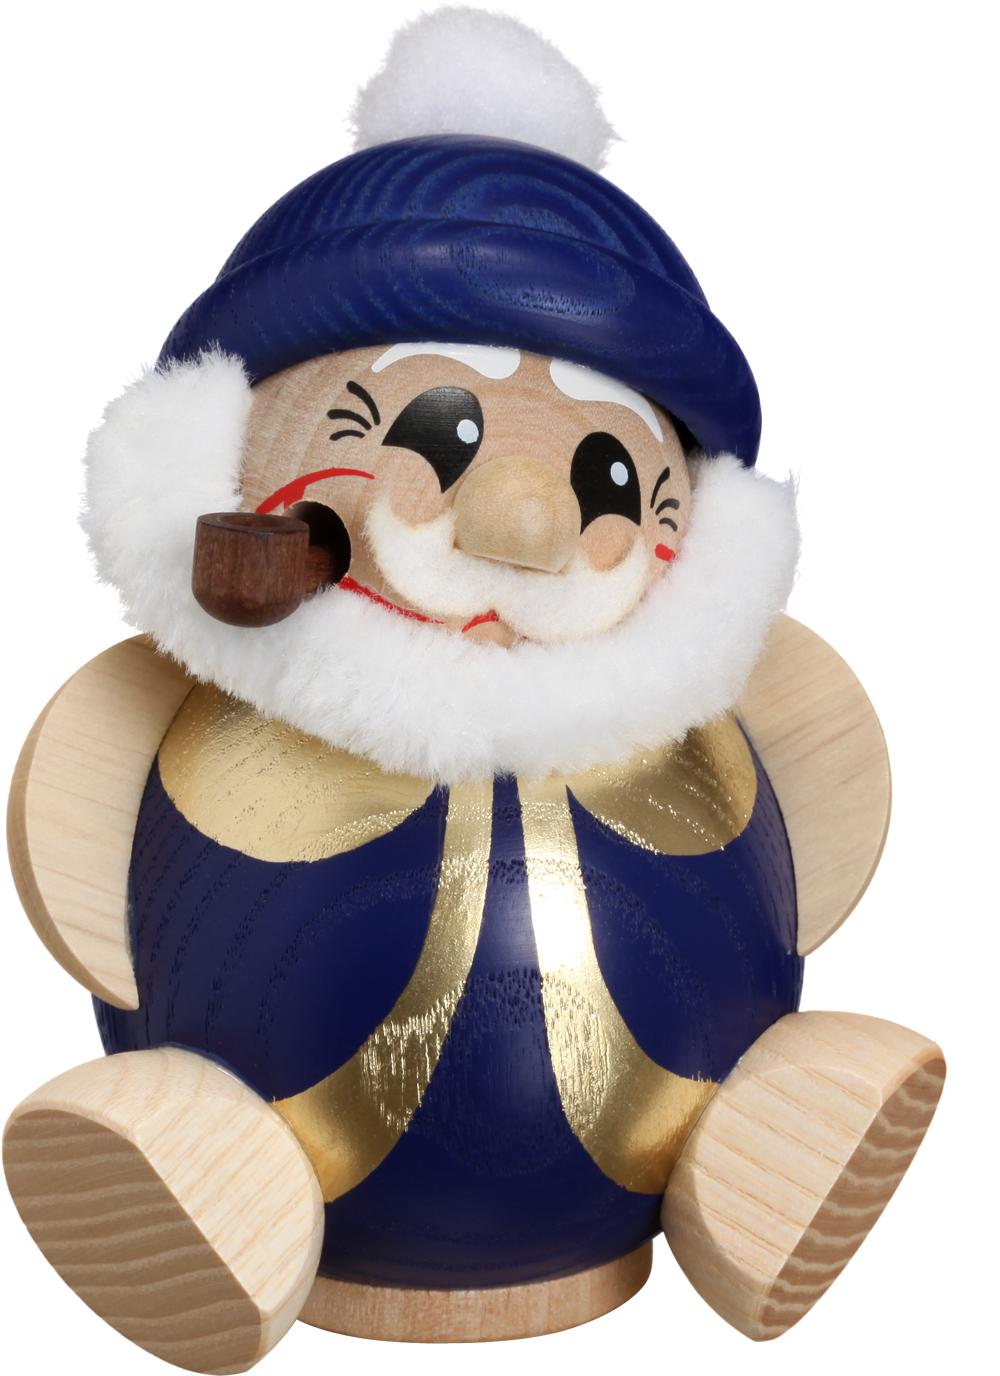 Kugelräucherfigur Nikolaus blau-gold **Neu 2016**